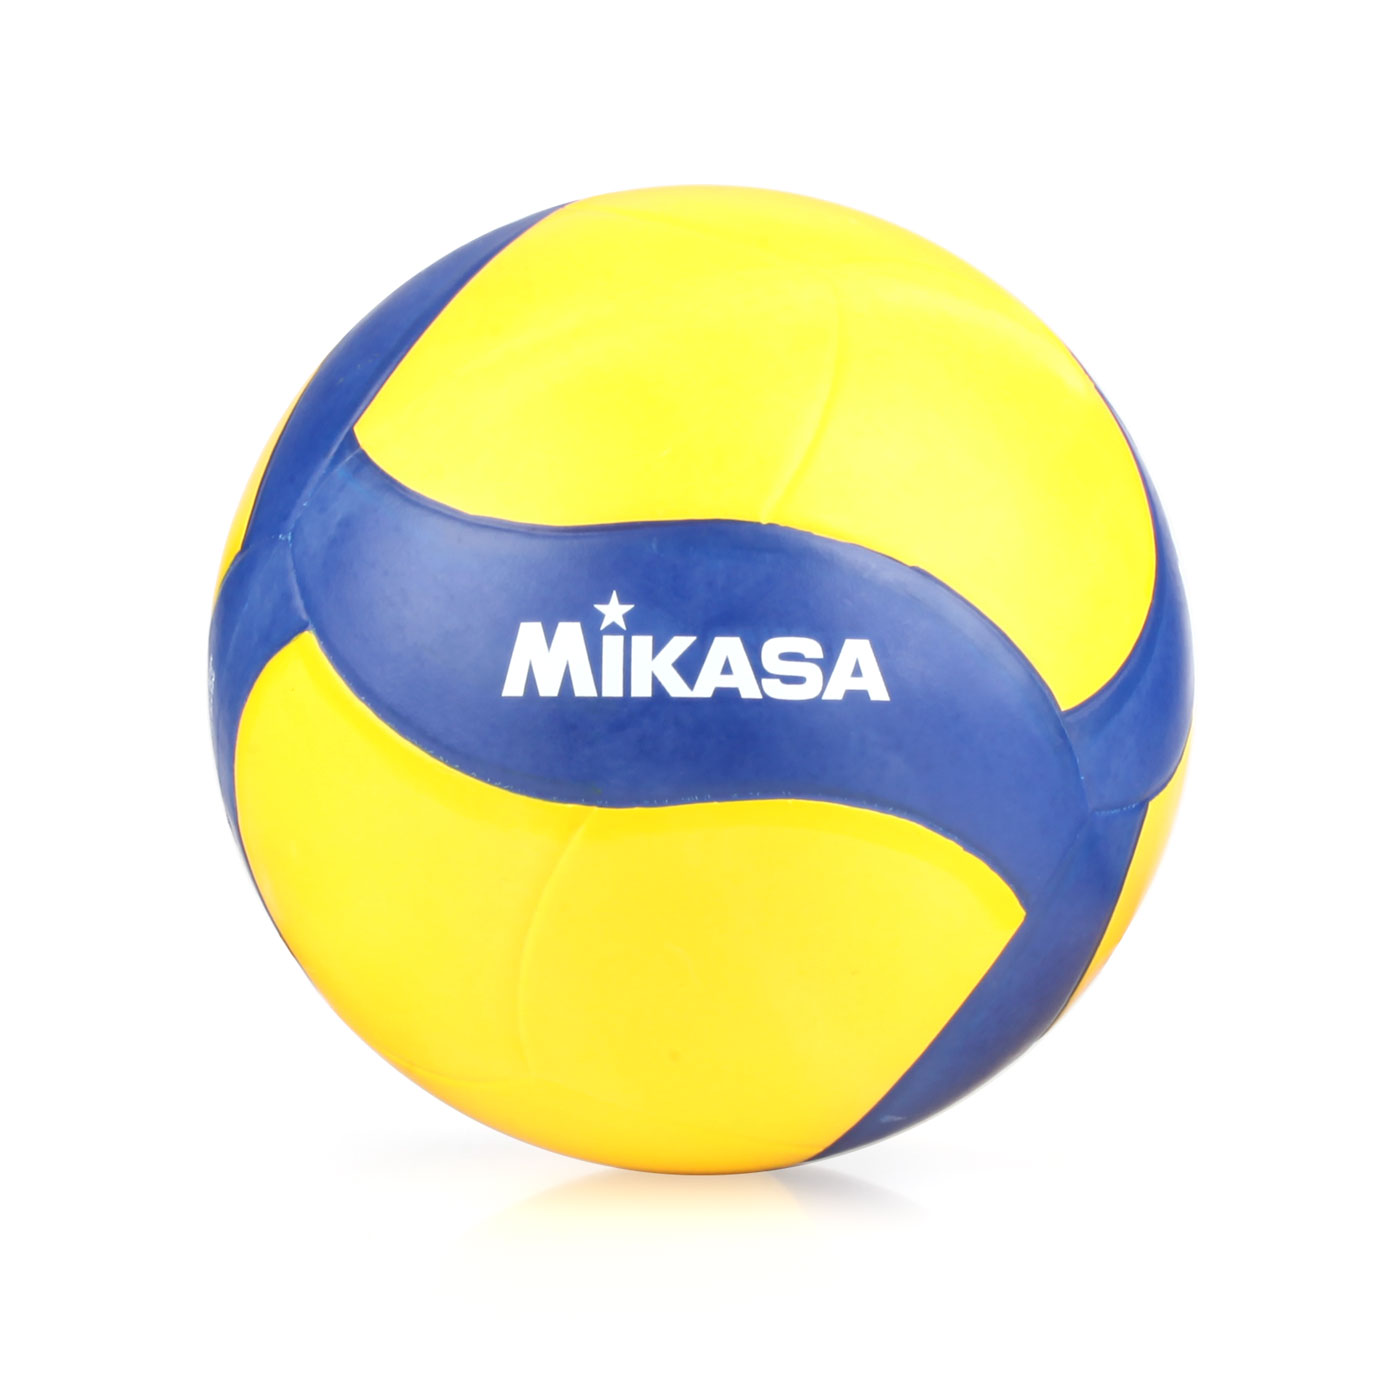 MIKASA 螺旋形橡膠排球 MKV020W - 黃深藍白